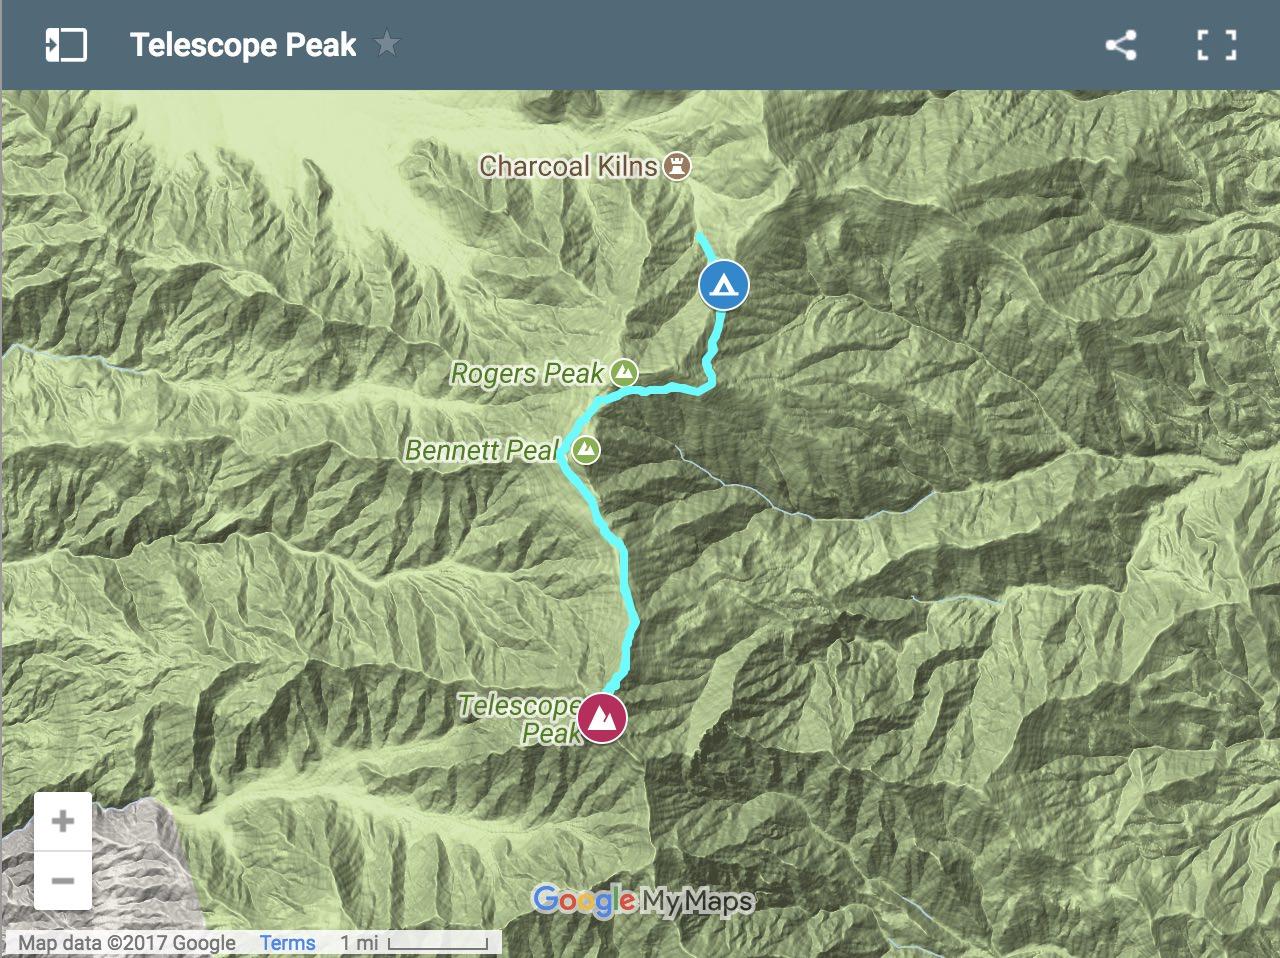 telescope-peak-my-maps